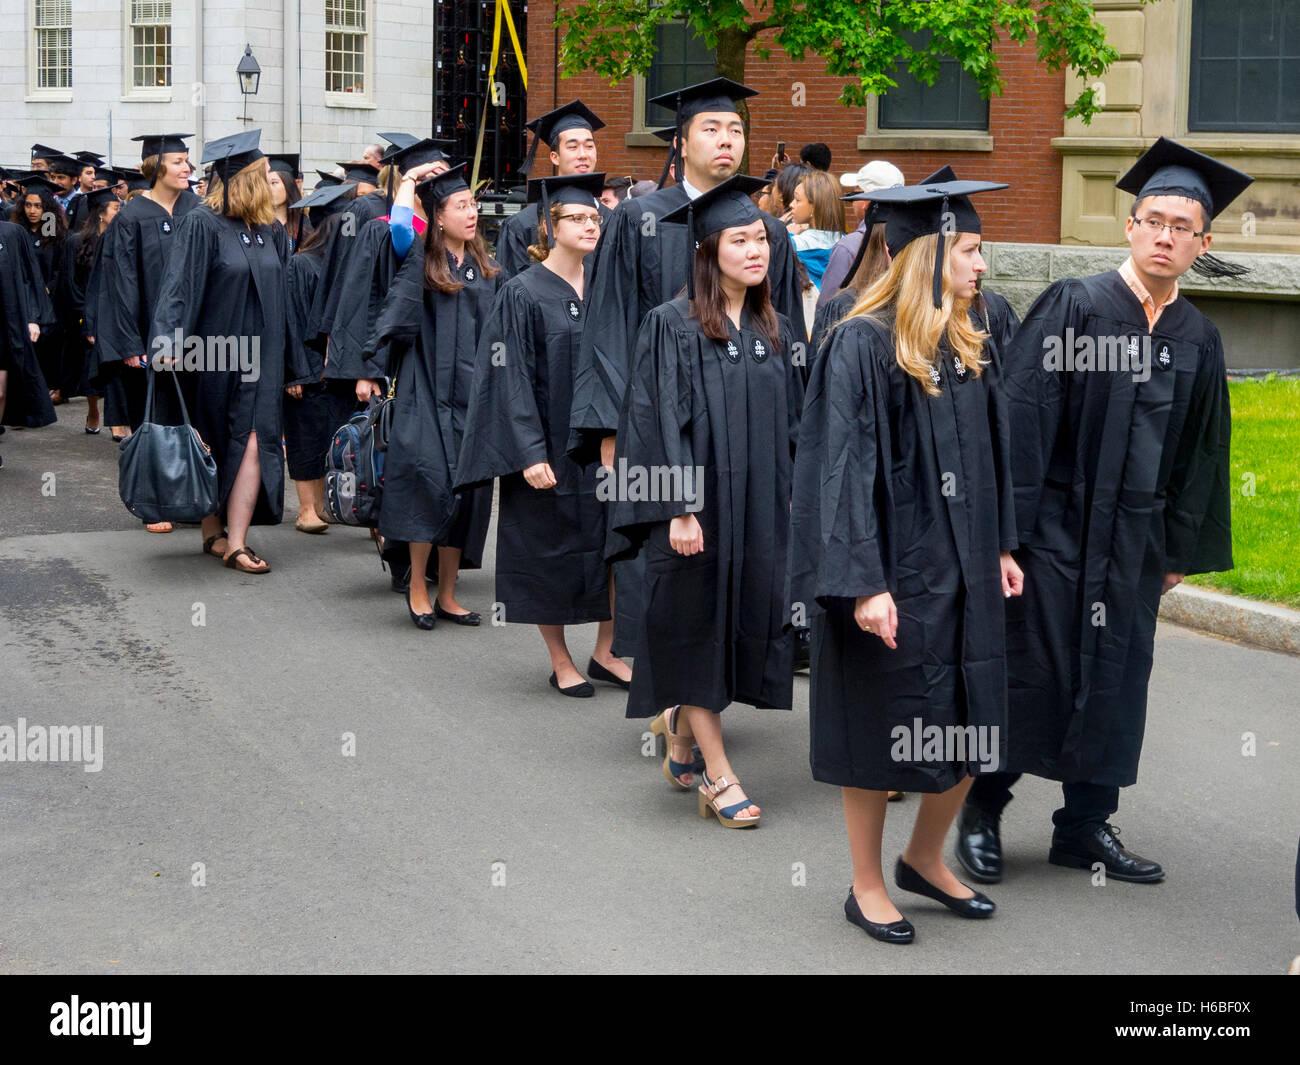 Men College Graduation Procession Stock Photos & Men College ...